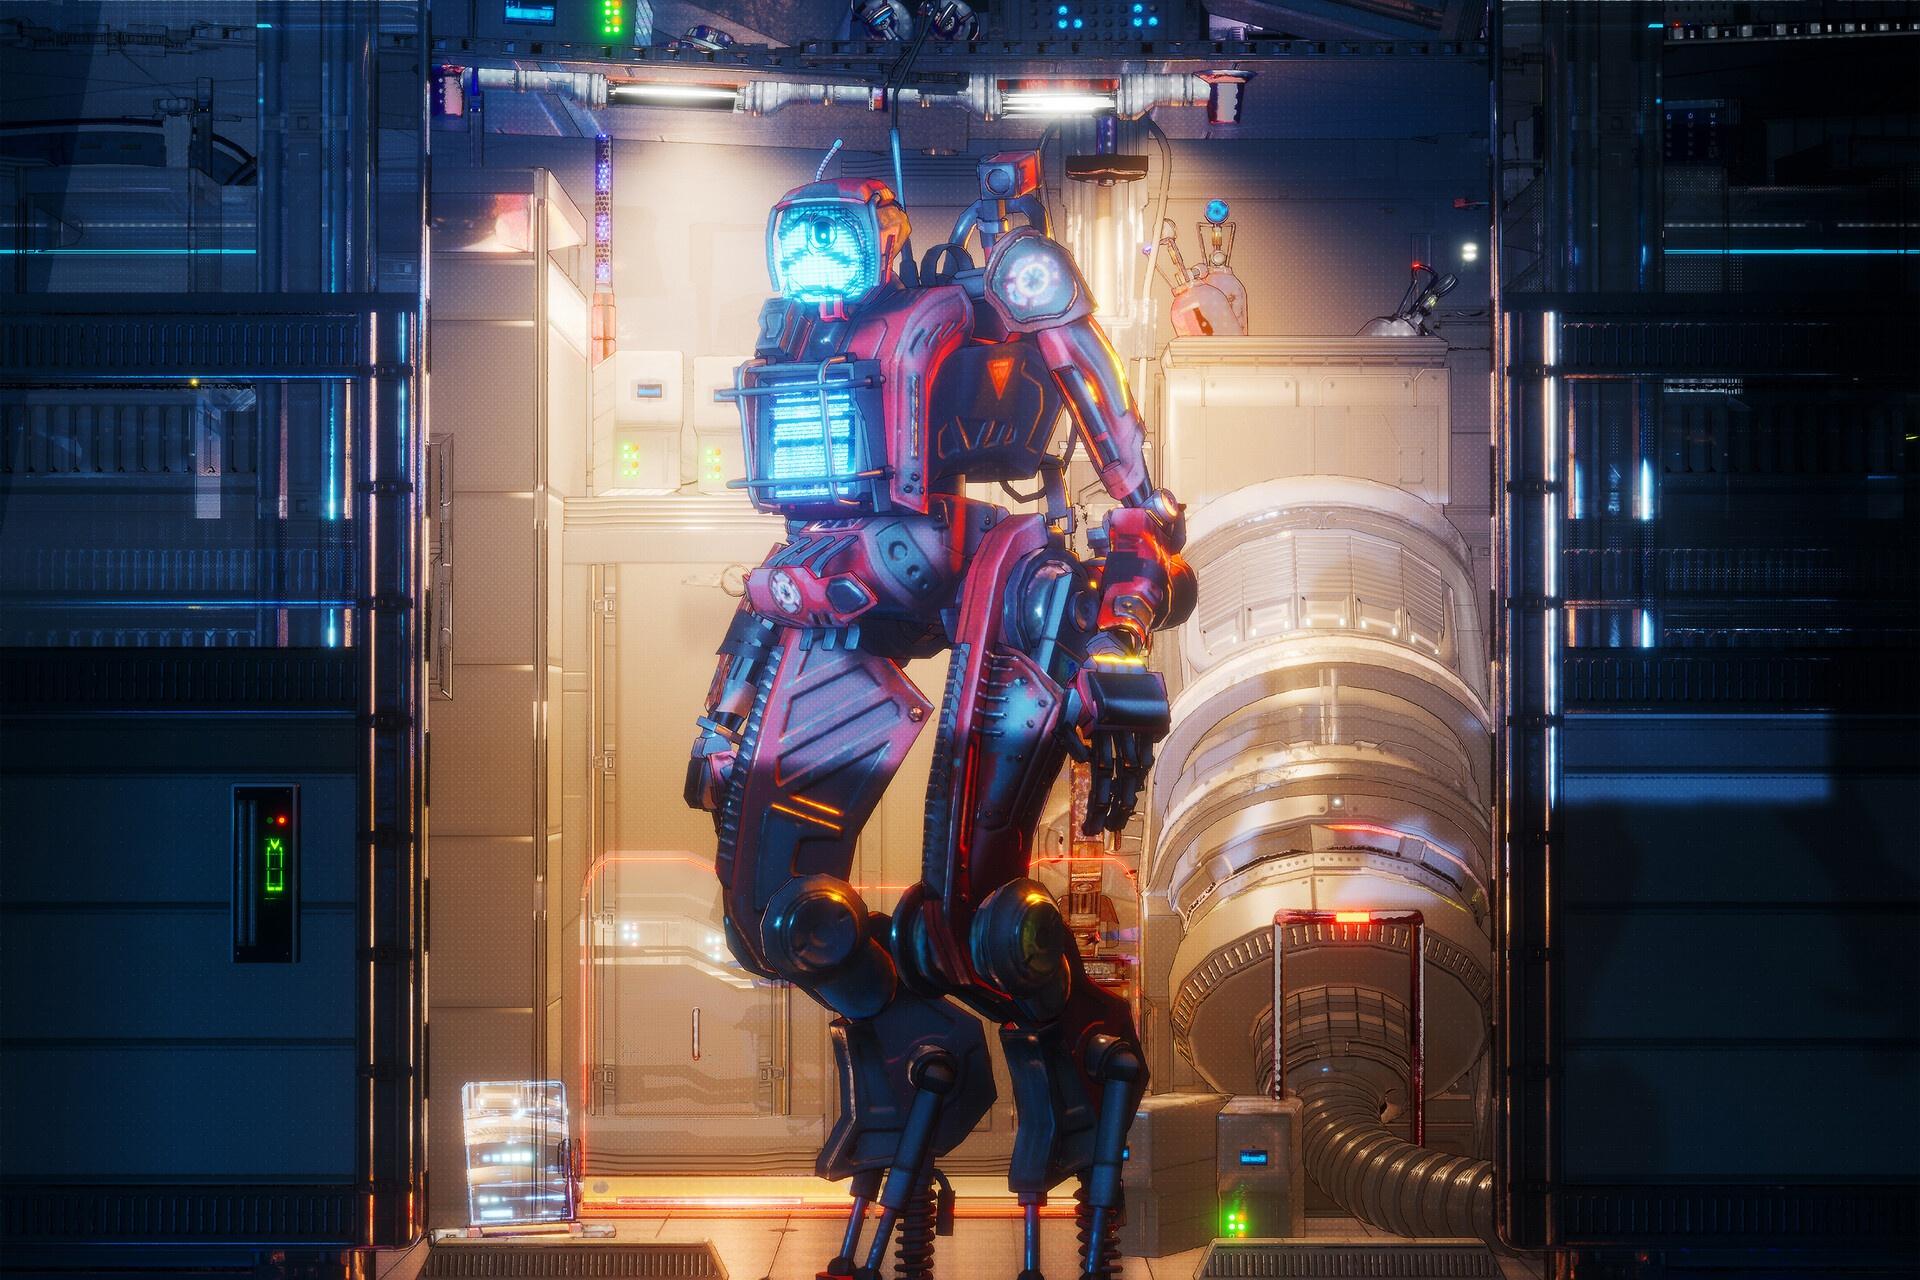 General 1920x1280 science fiction machine robot digital art Apex Legends Pathfinder